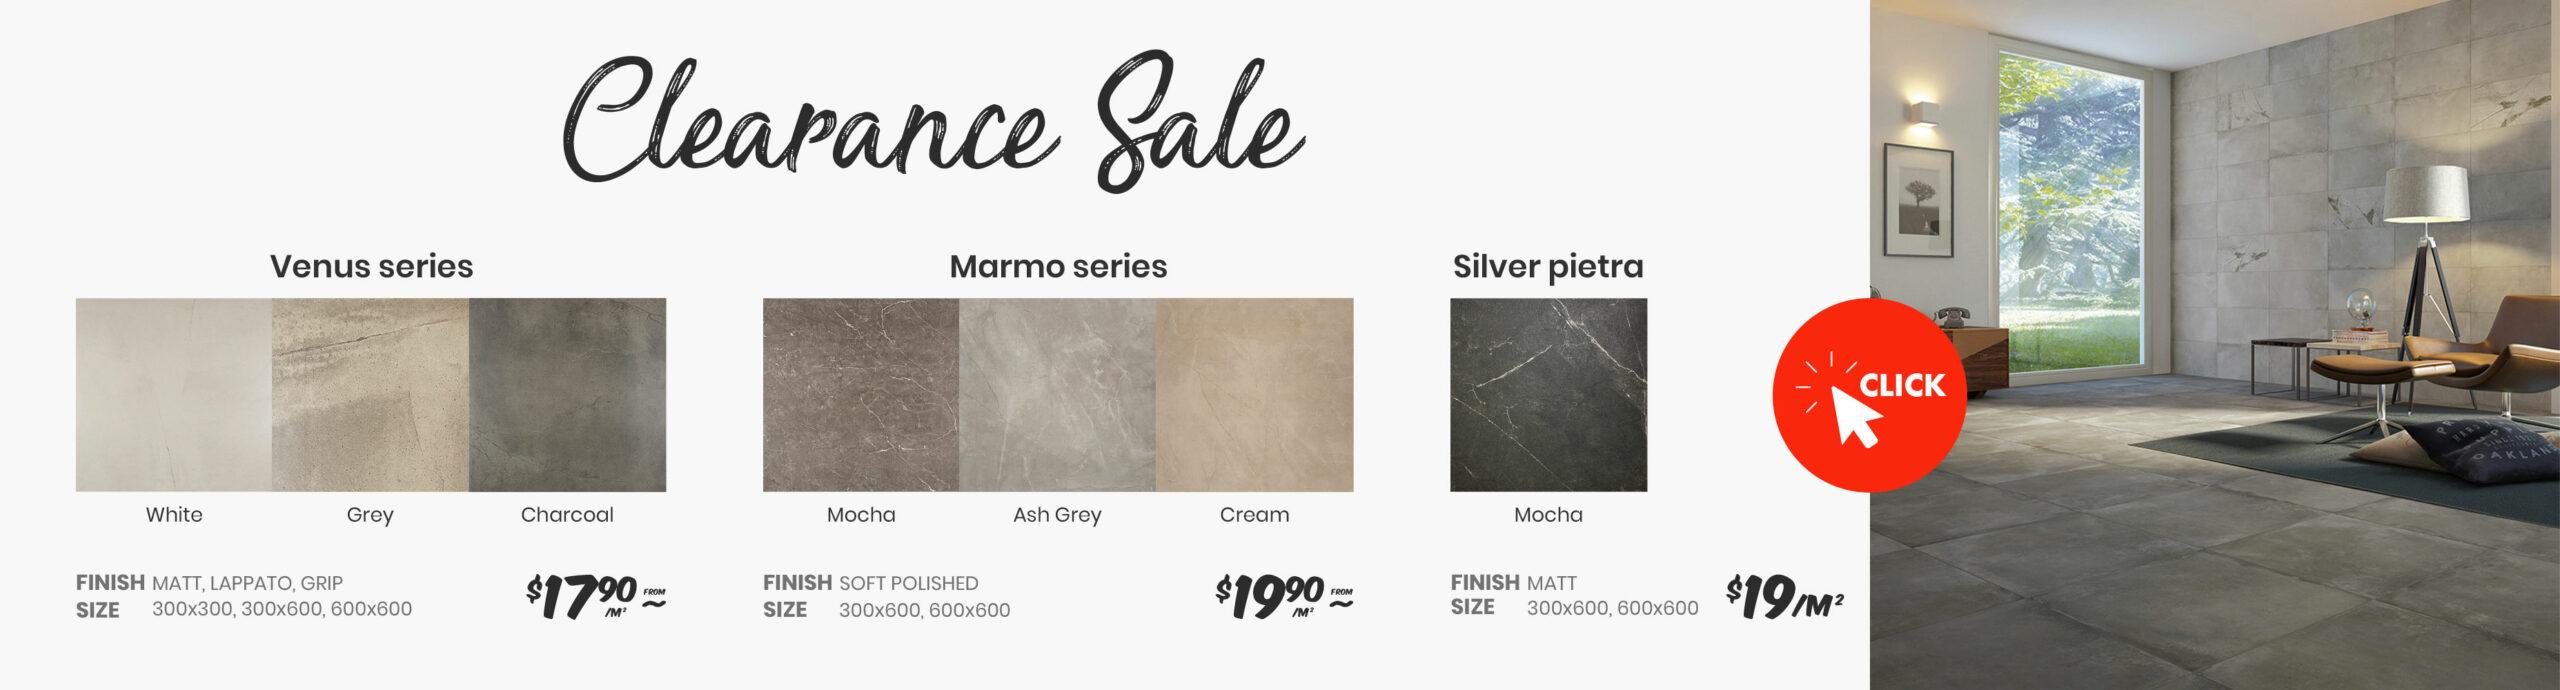 clearance tiles - venus series/marmo series/silver pietra